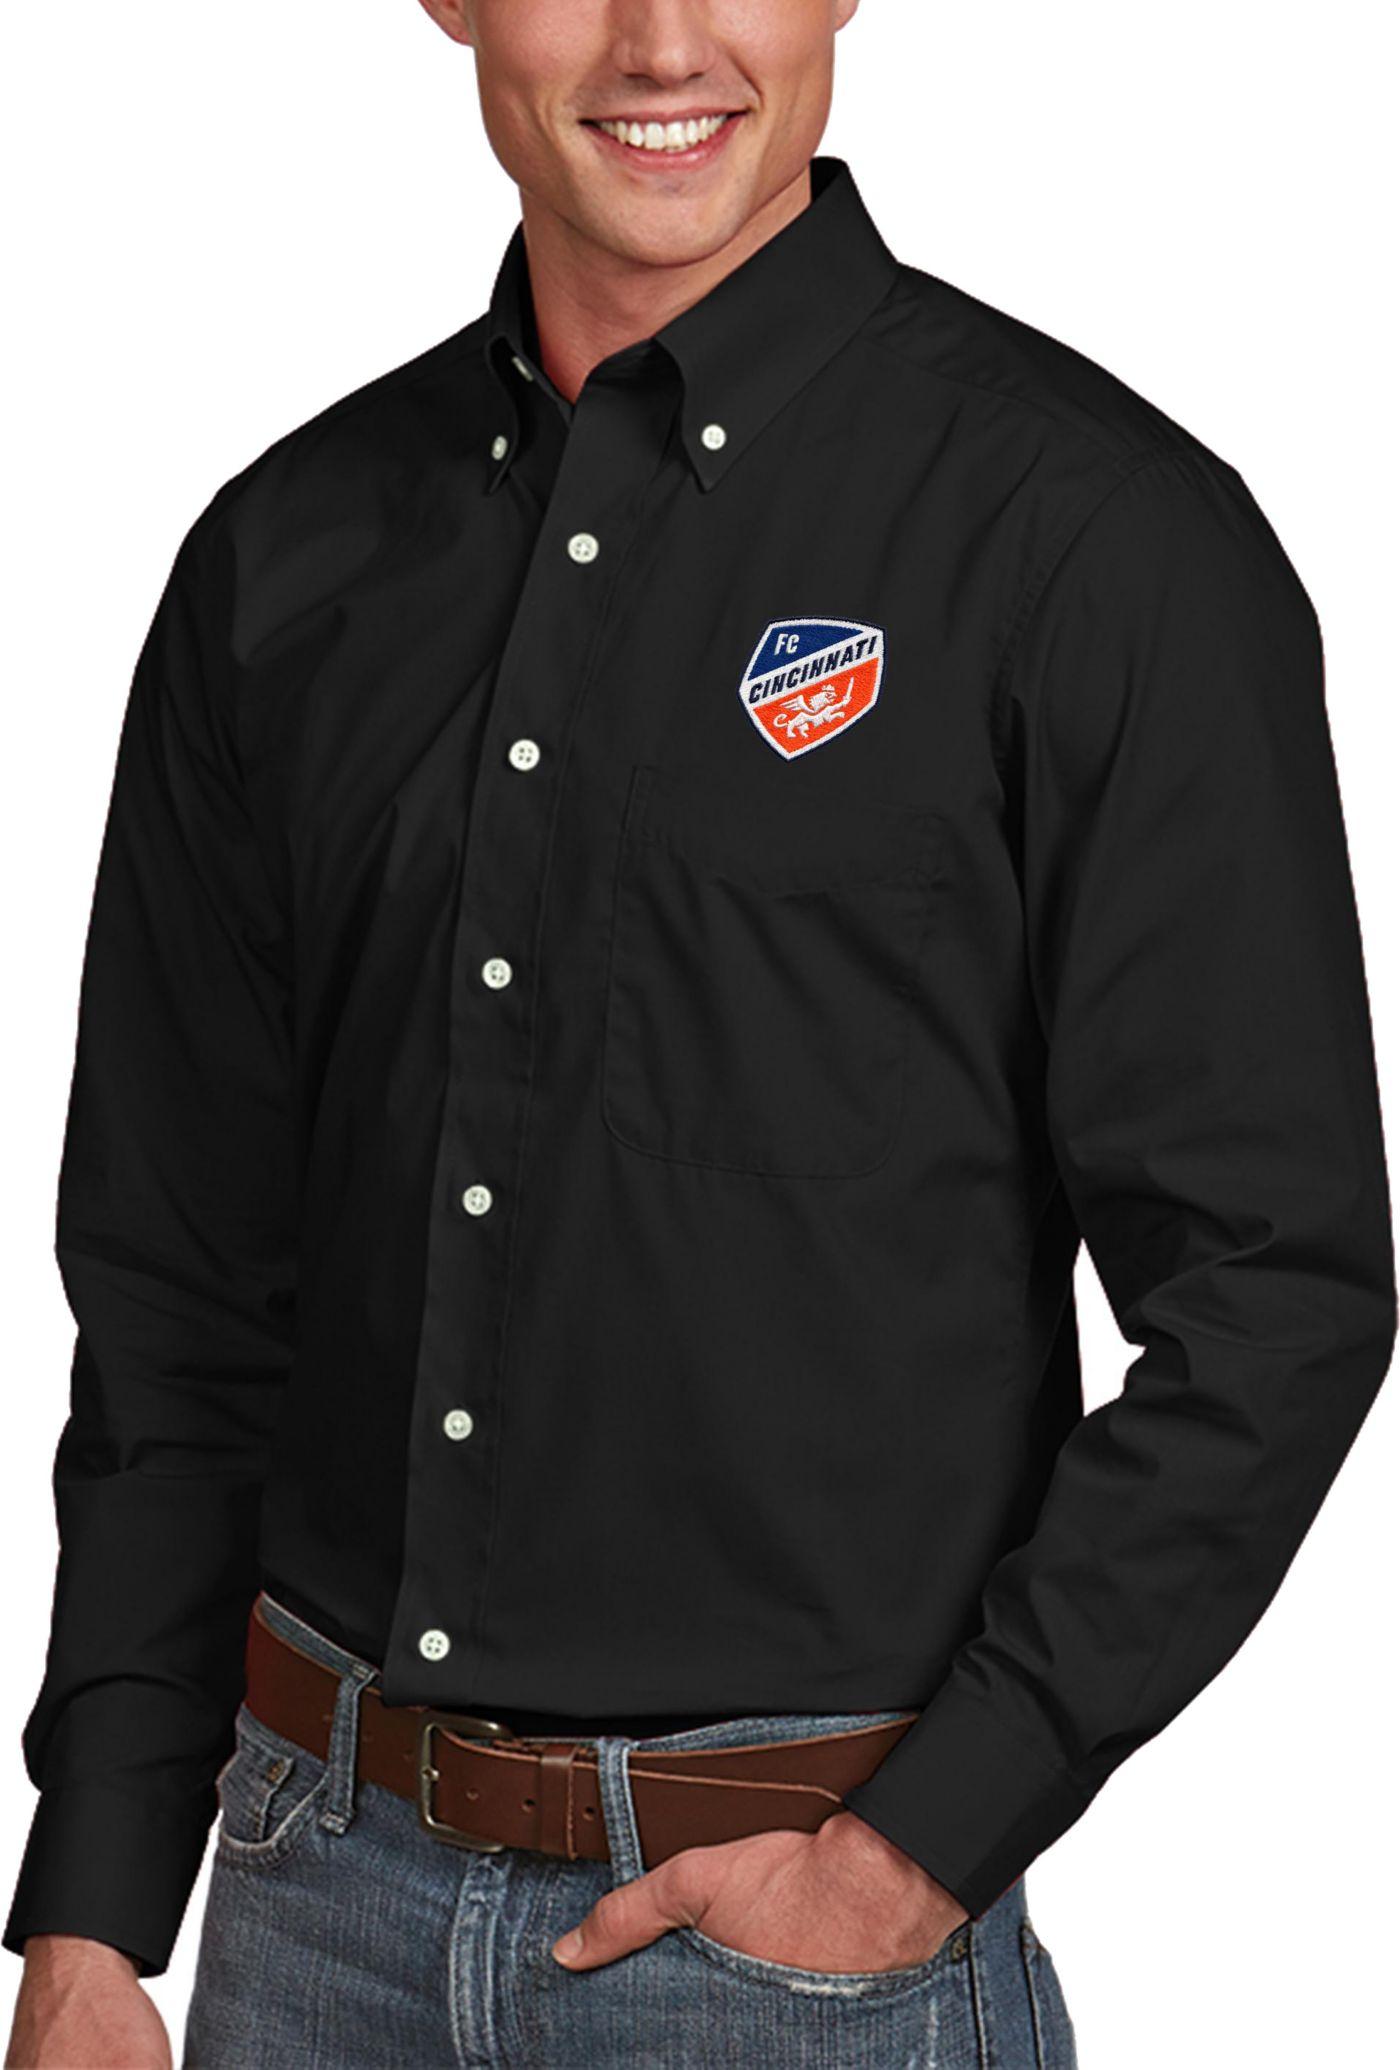 Antigua Men's FC Cincinnati Dynasty Black Button Down Long Sleeve Shirt